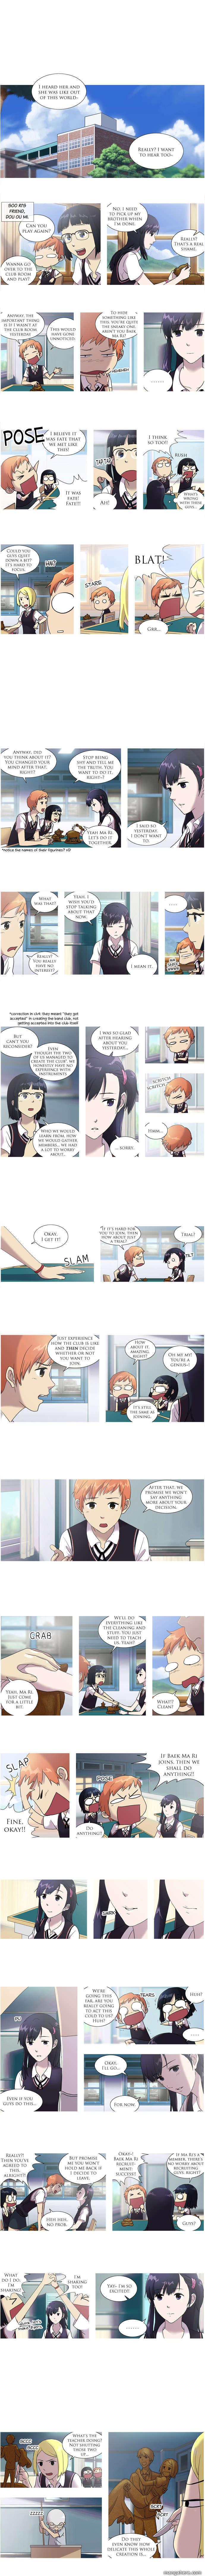 Orange Marmalade 6 Page 1